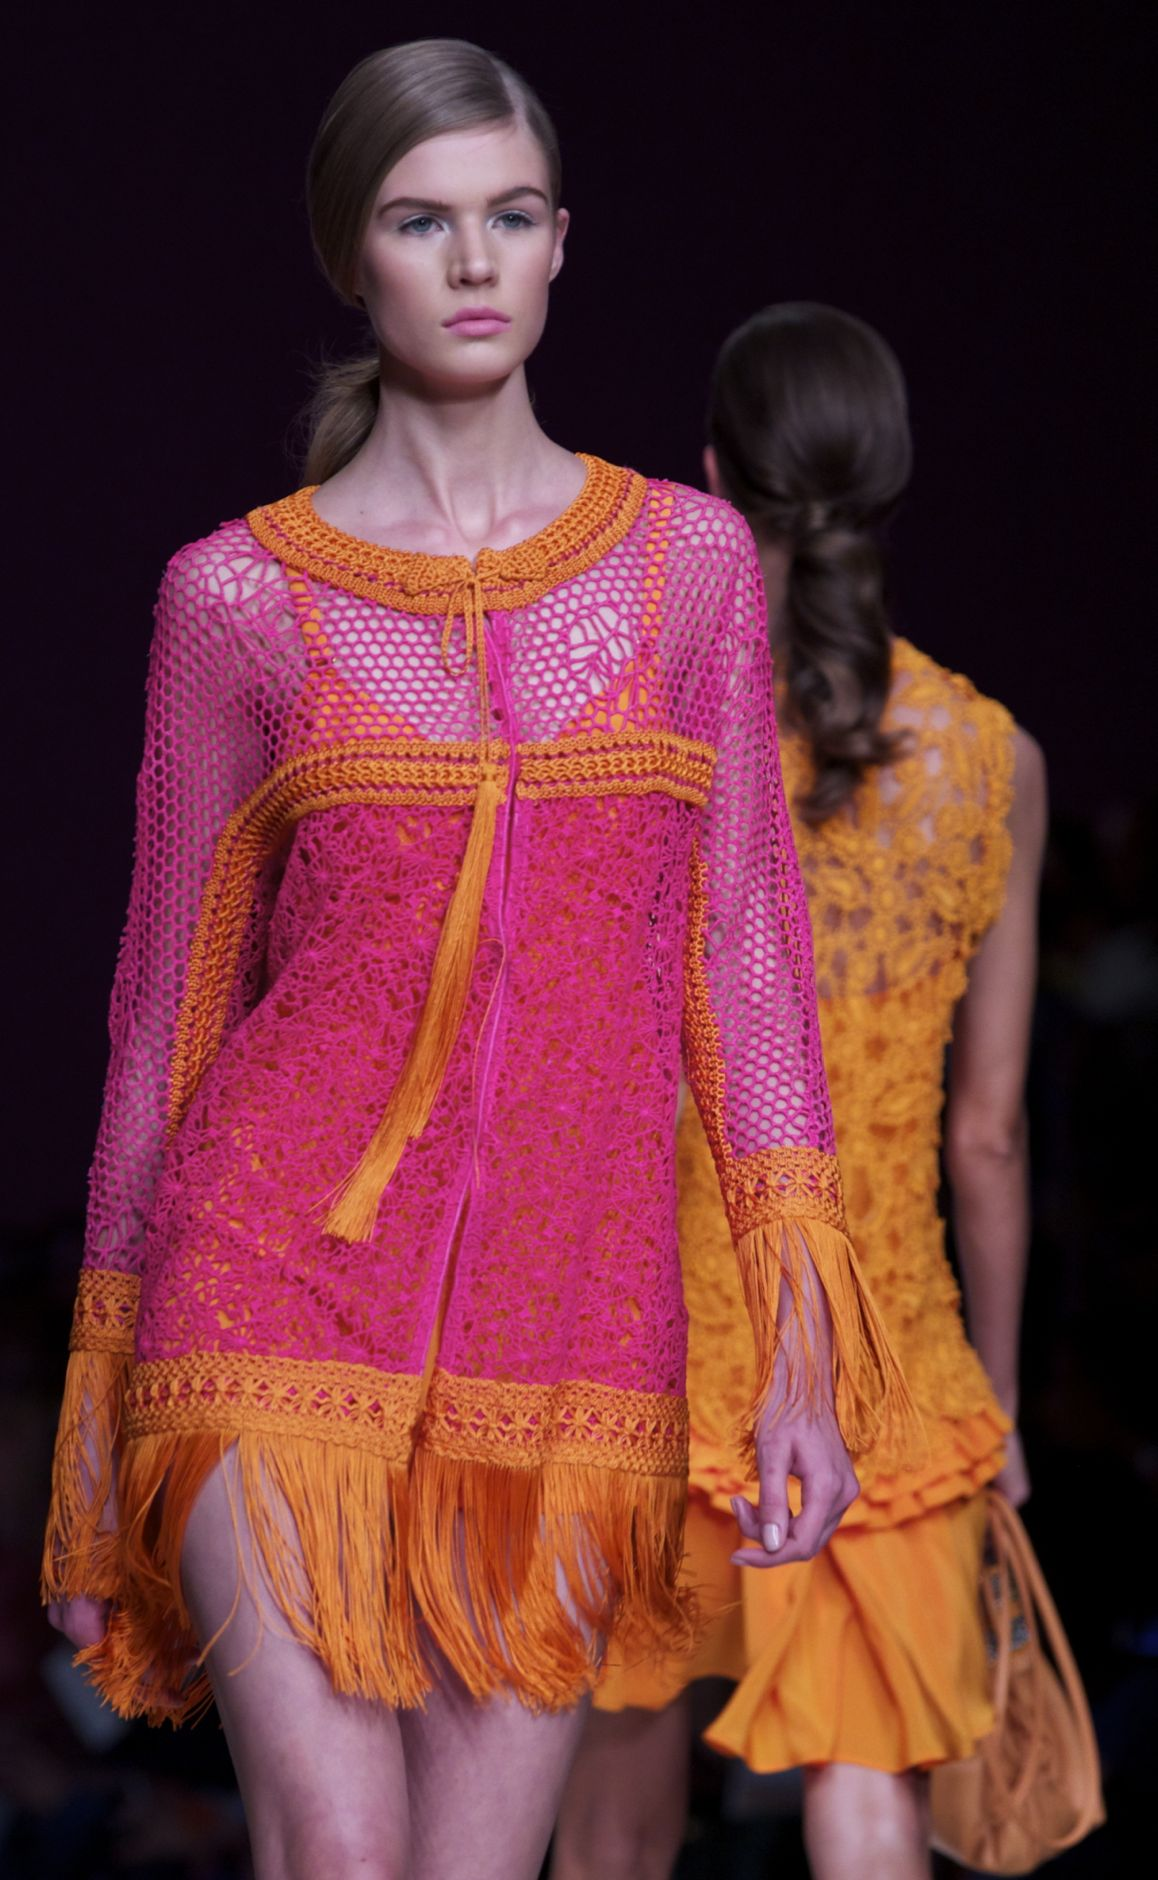 Ermanno Scervino Women's Collection 2013